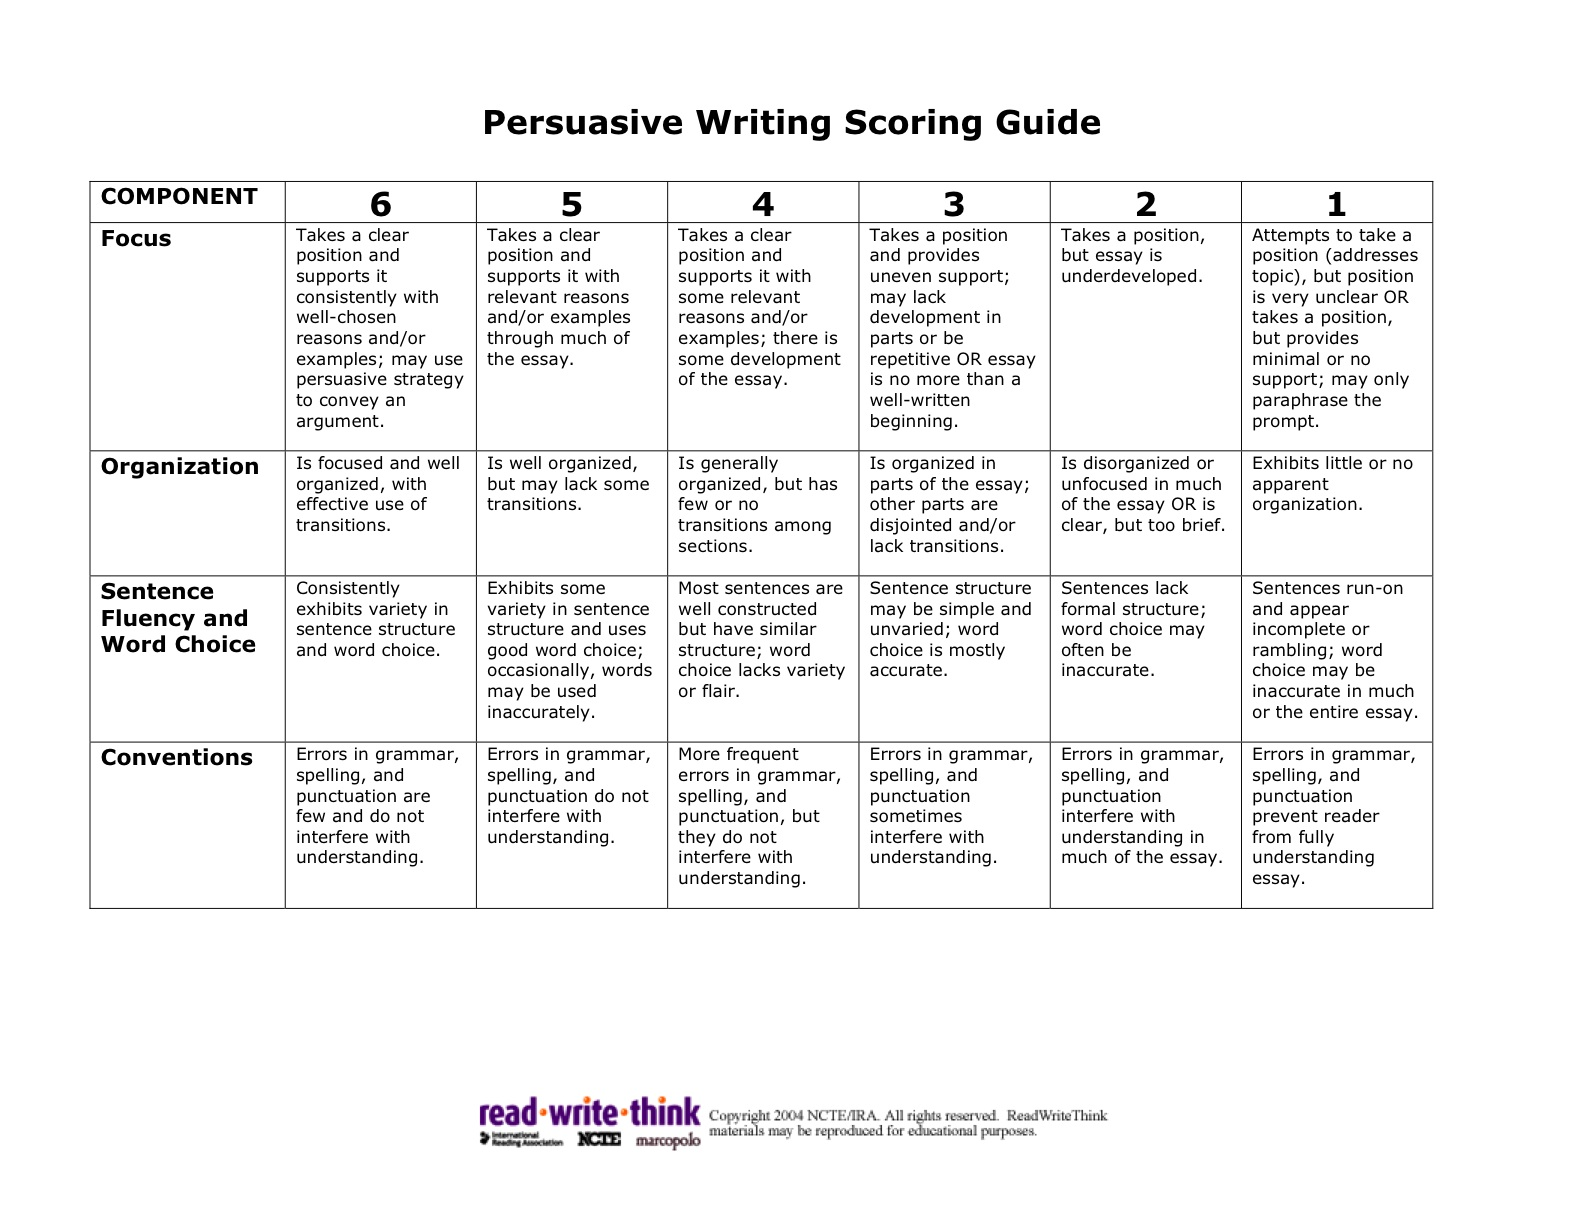 016 Essay Example Persuasivewritingscoringguide Persuasive Stunning Rubric Argumentative Grade 10 8th Doc Middle School Pdf Full